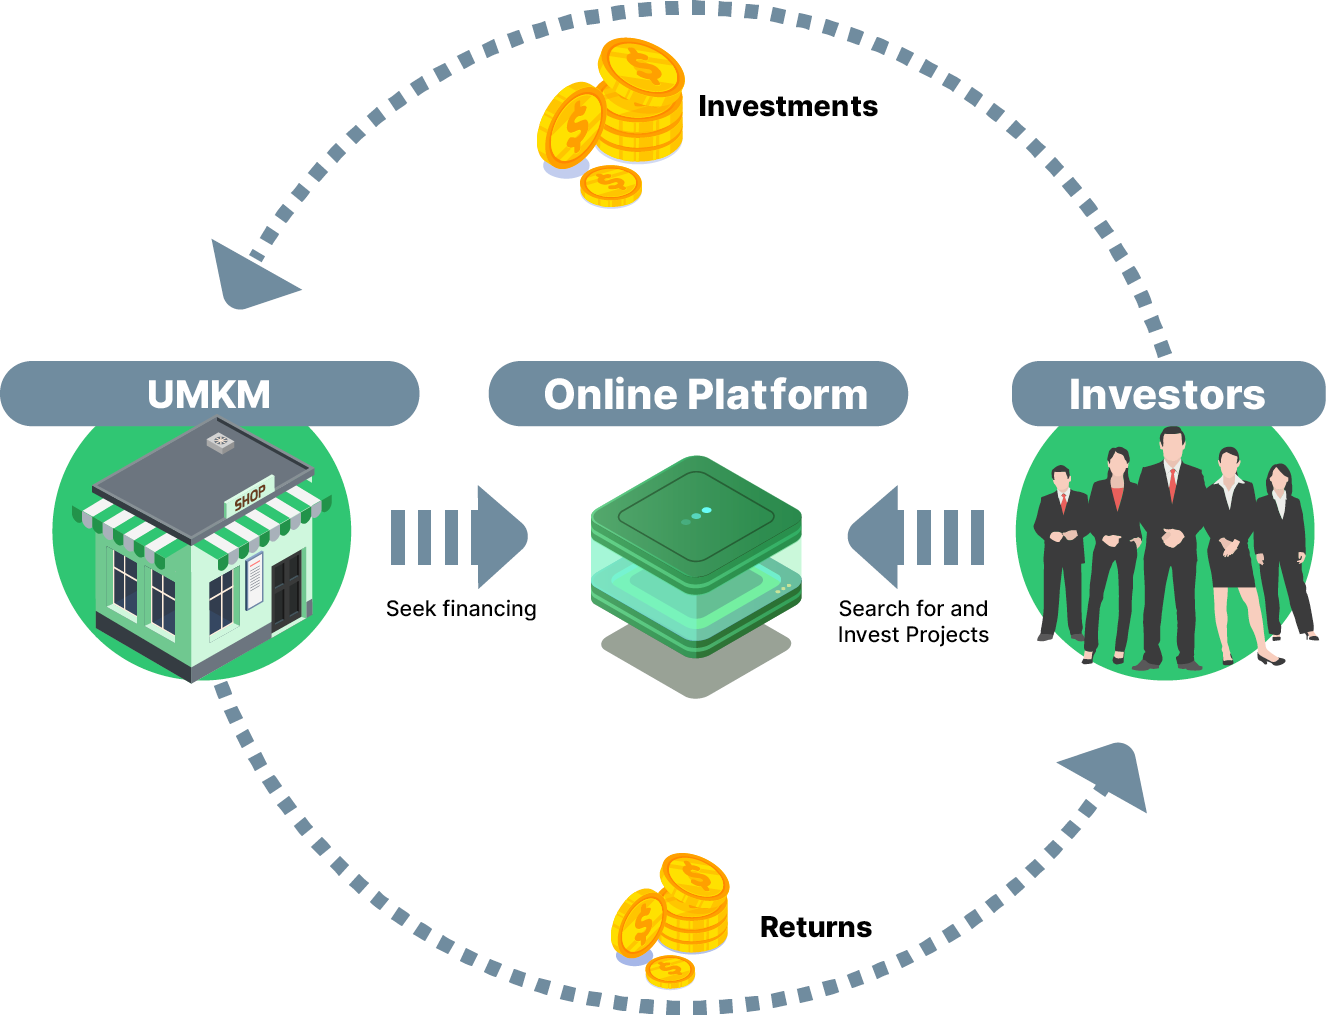 Memahami Konsep Investasi Melalui Equity Crowdfunding (ECF)